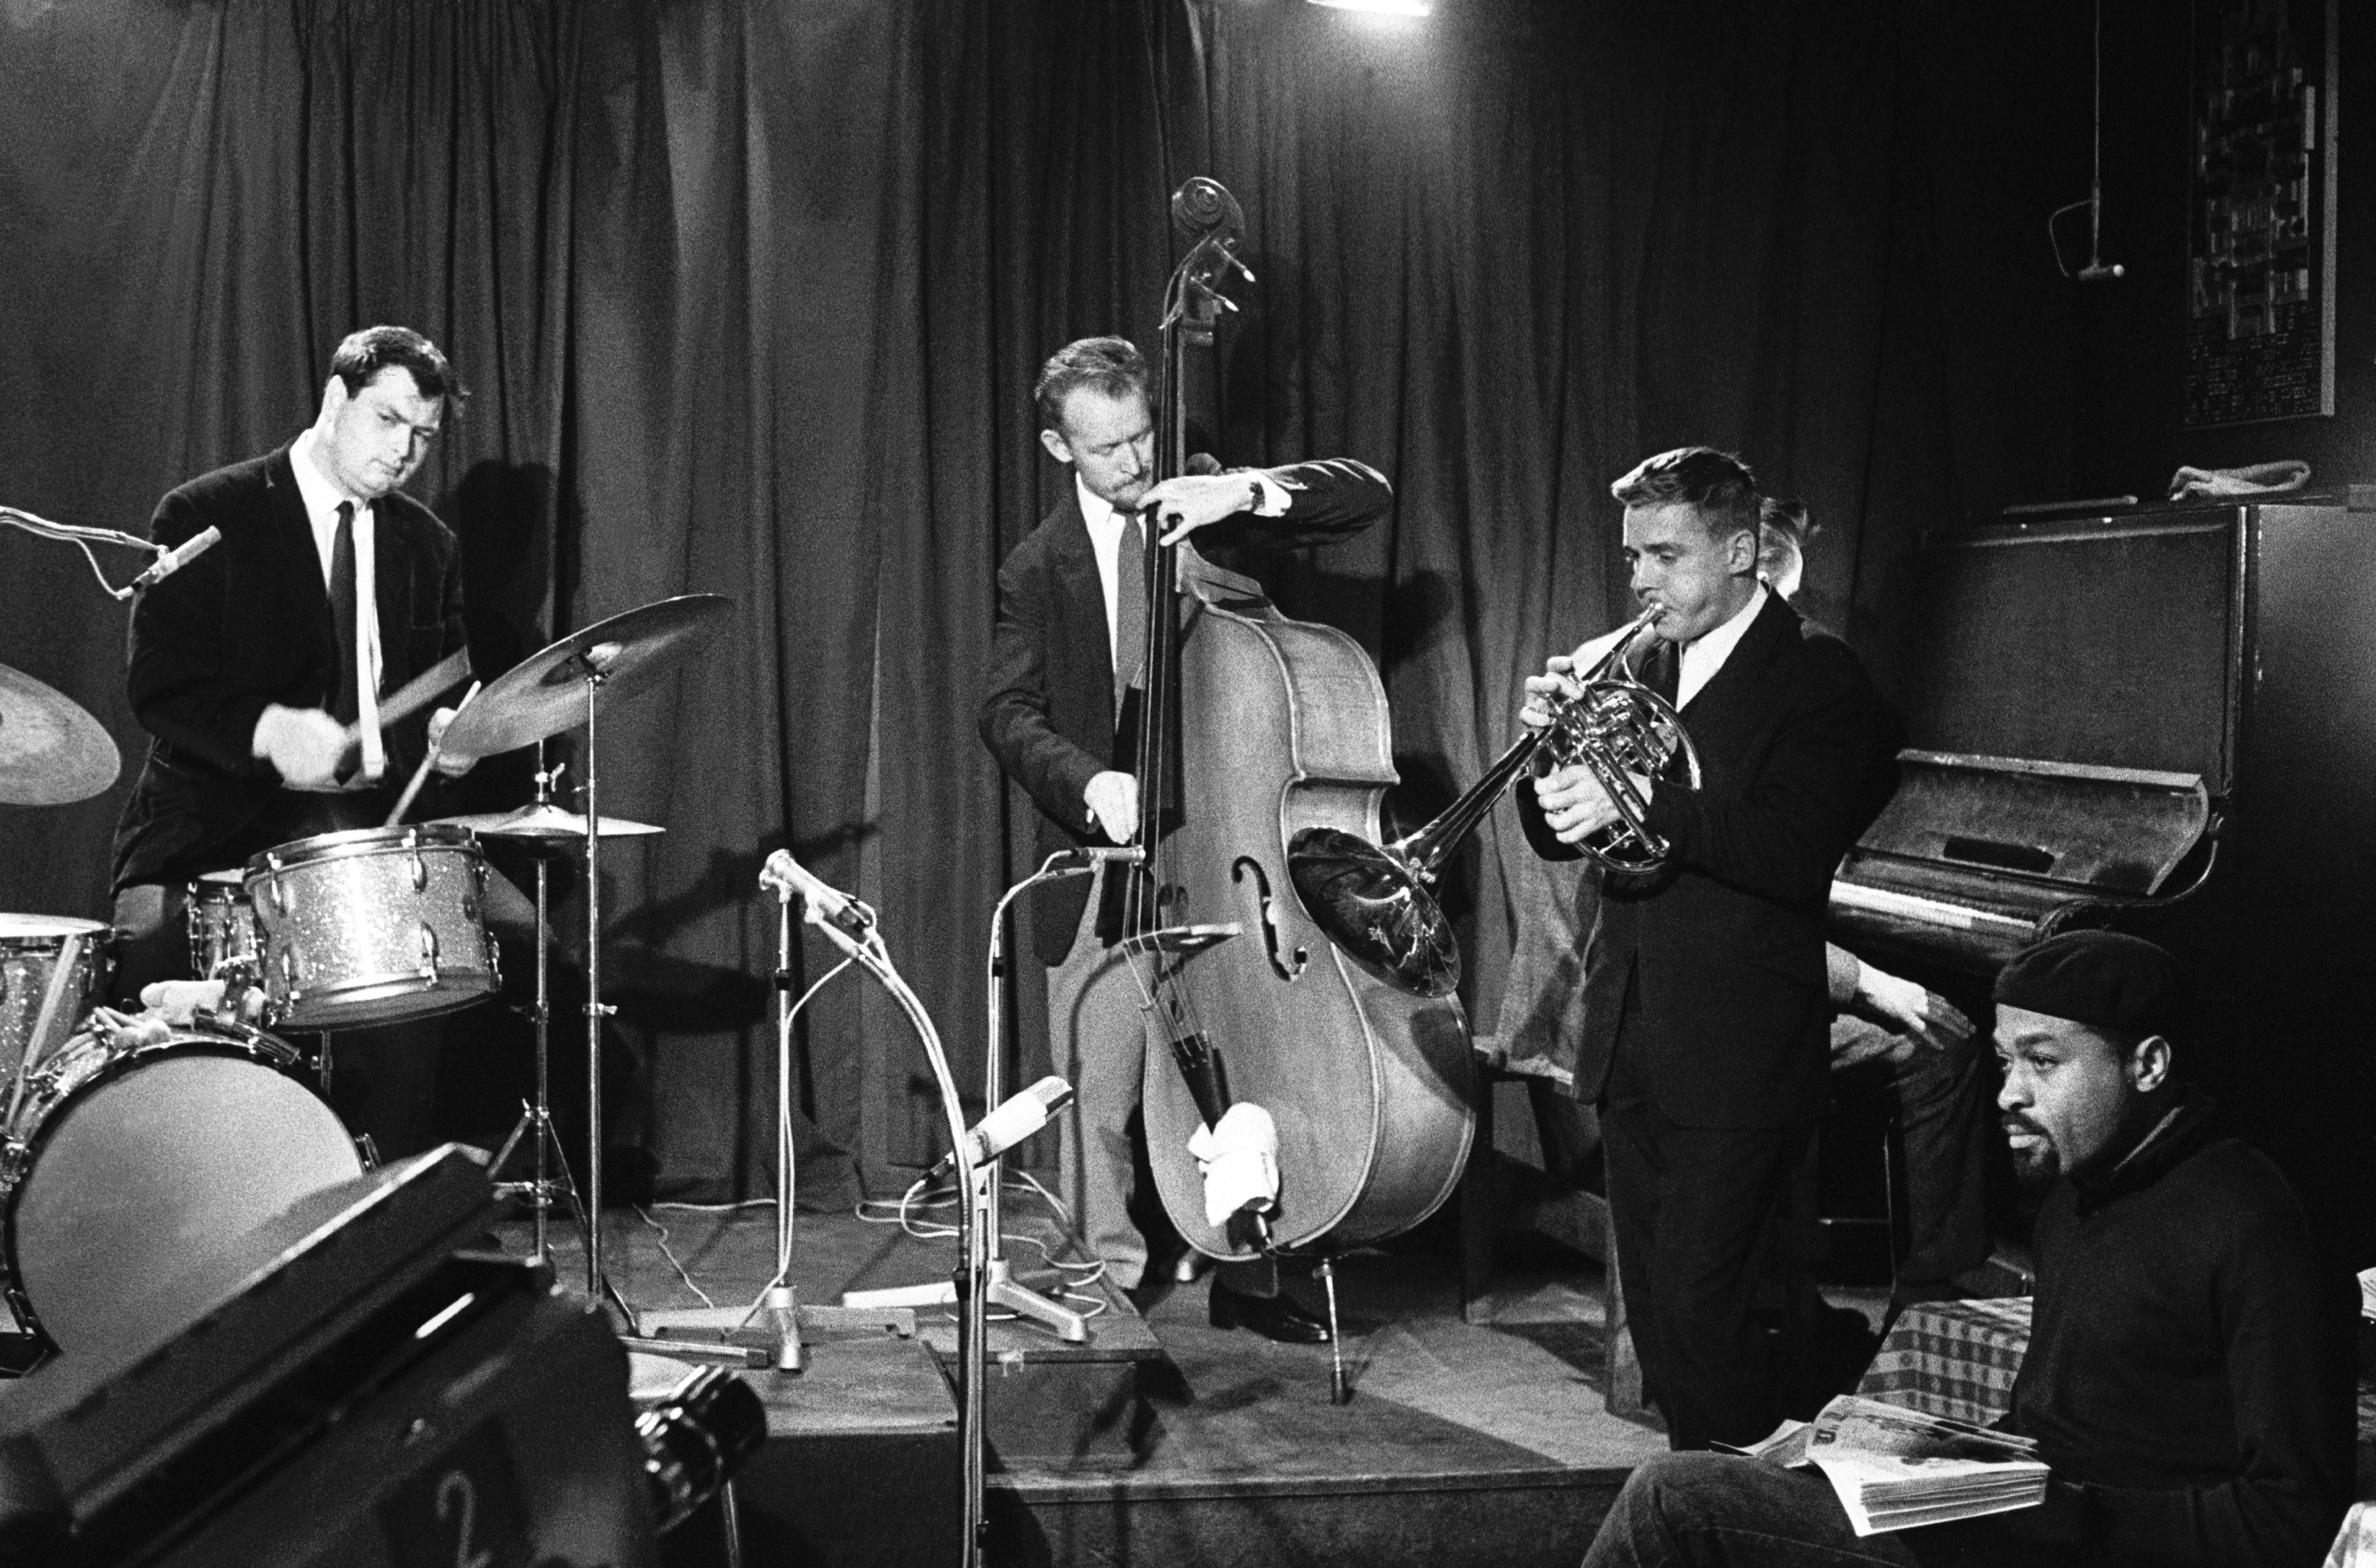 Finn Mickelborg with unknown drummer,Hugo Rasmussen & Atli Bjørn at Vingården Copenhagen 1966.In the foreground poet Ted Jones